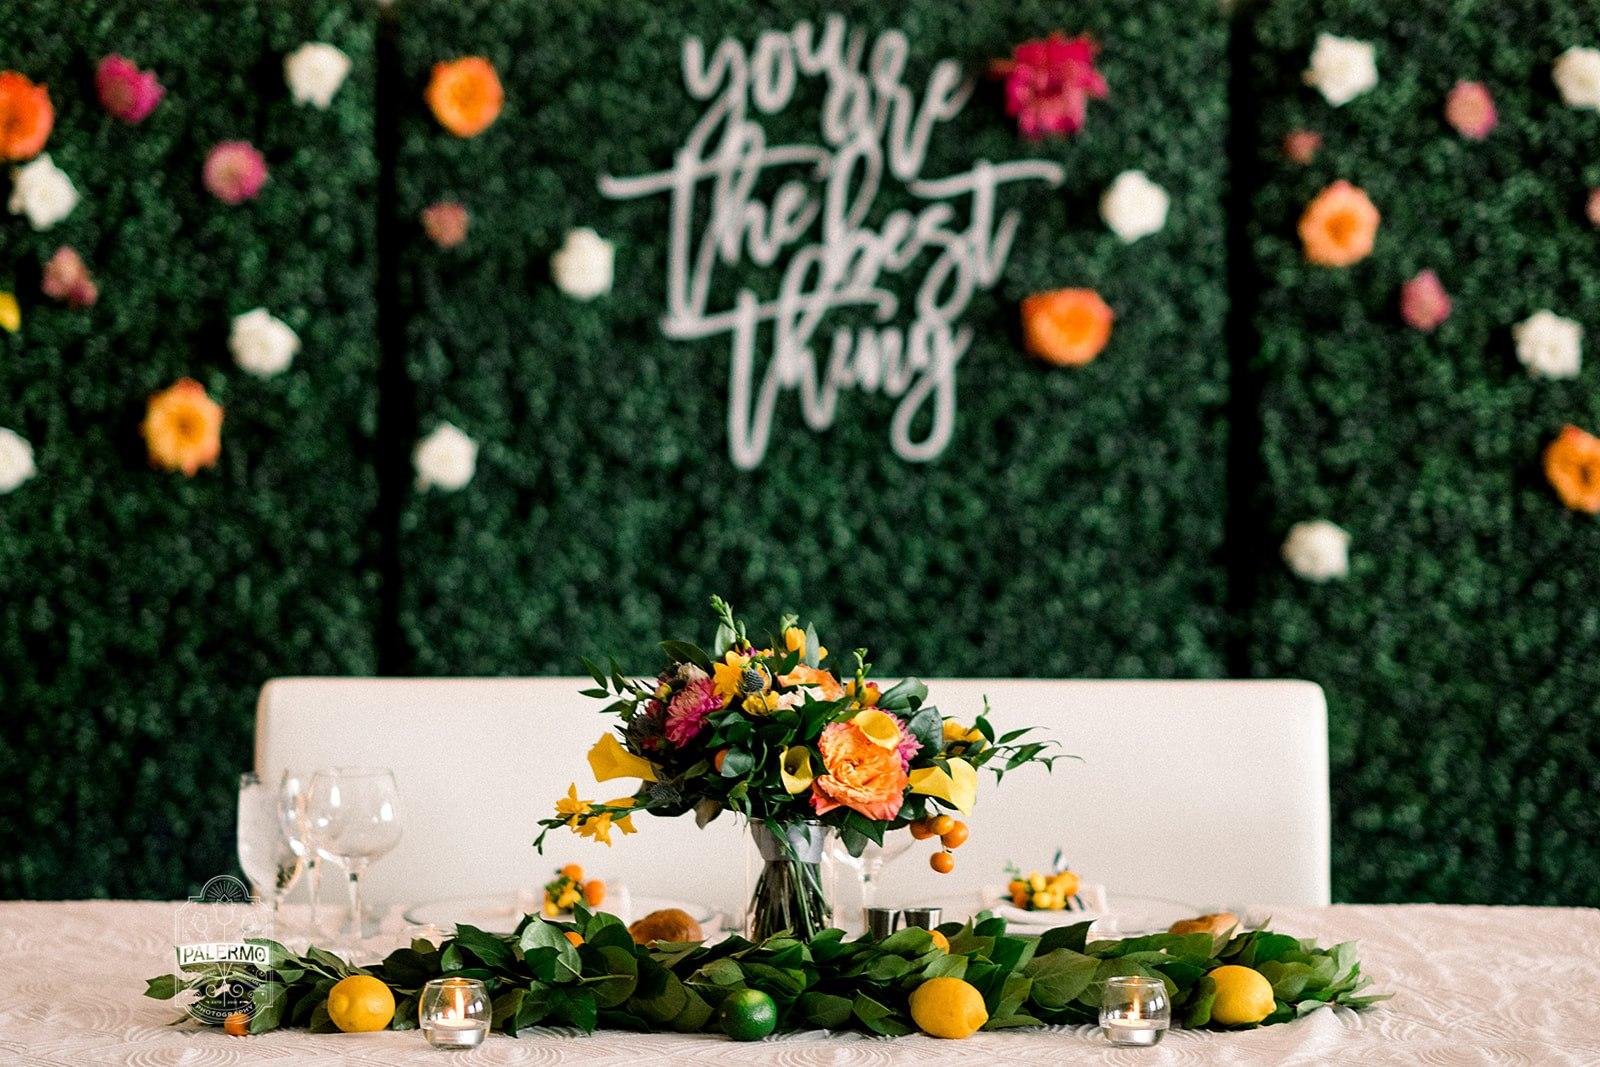 boxwood hedges backdrop head table Fairmont wedding reception bridal bouquet